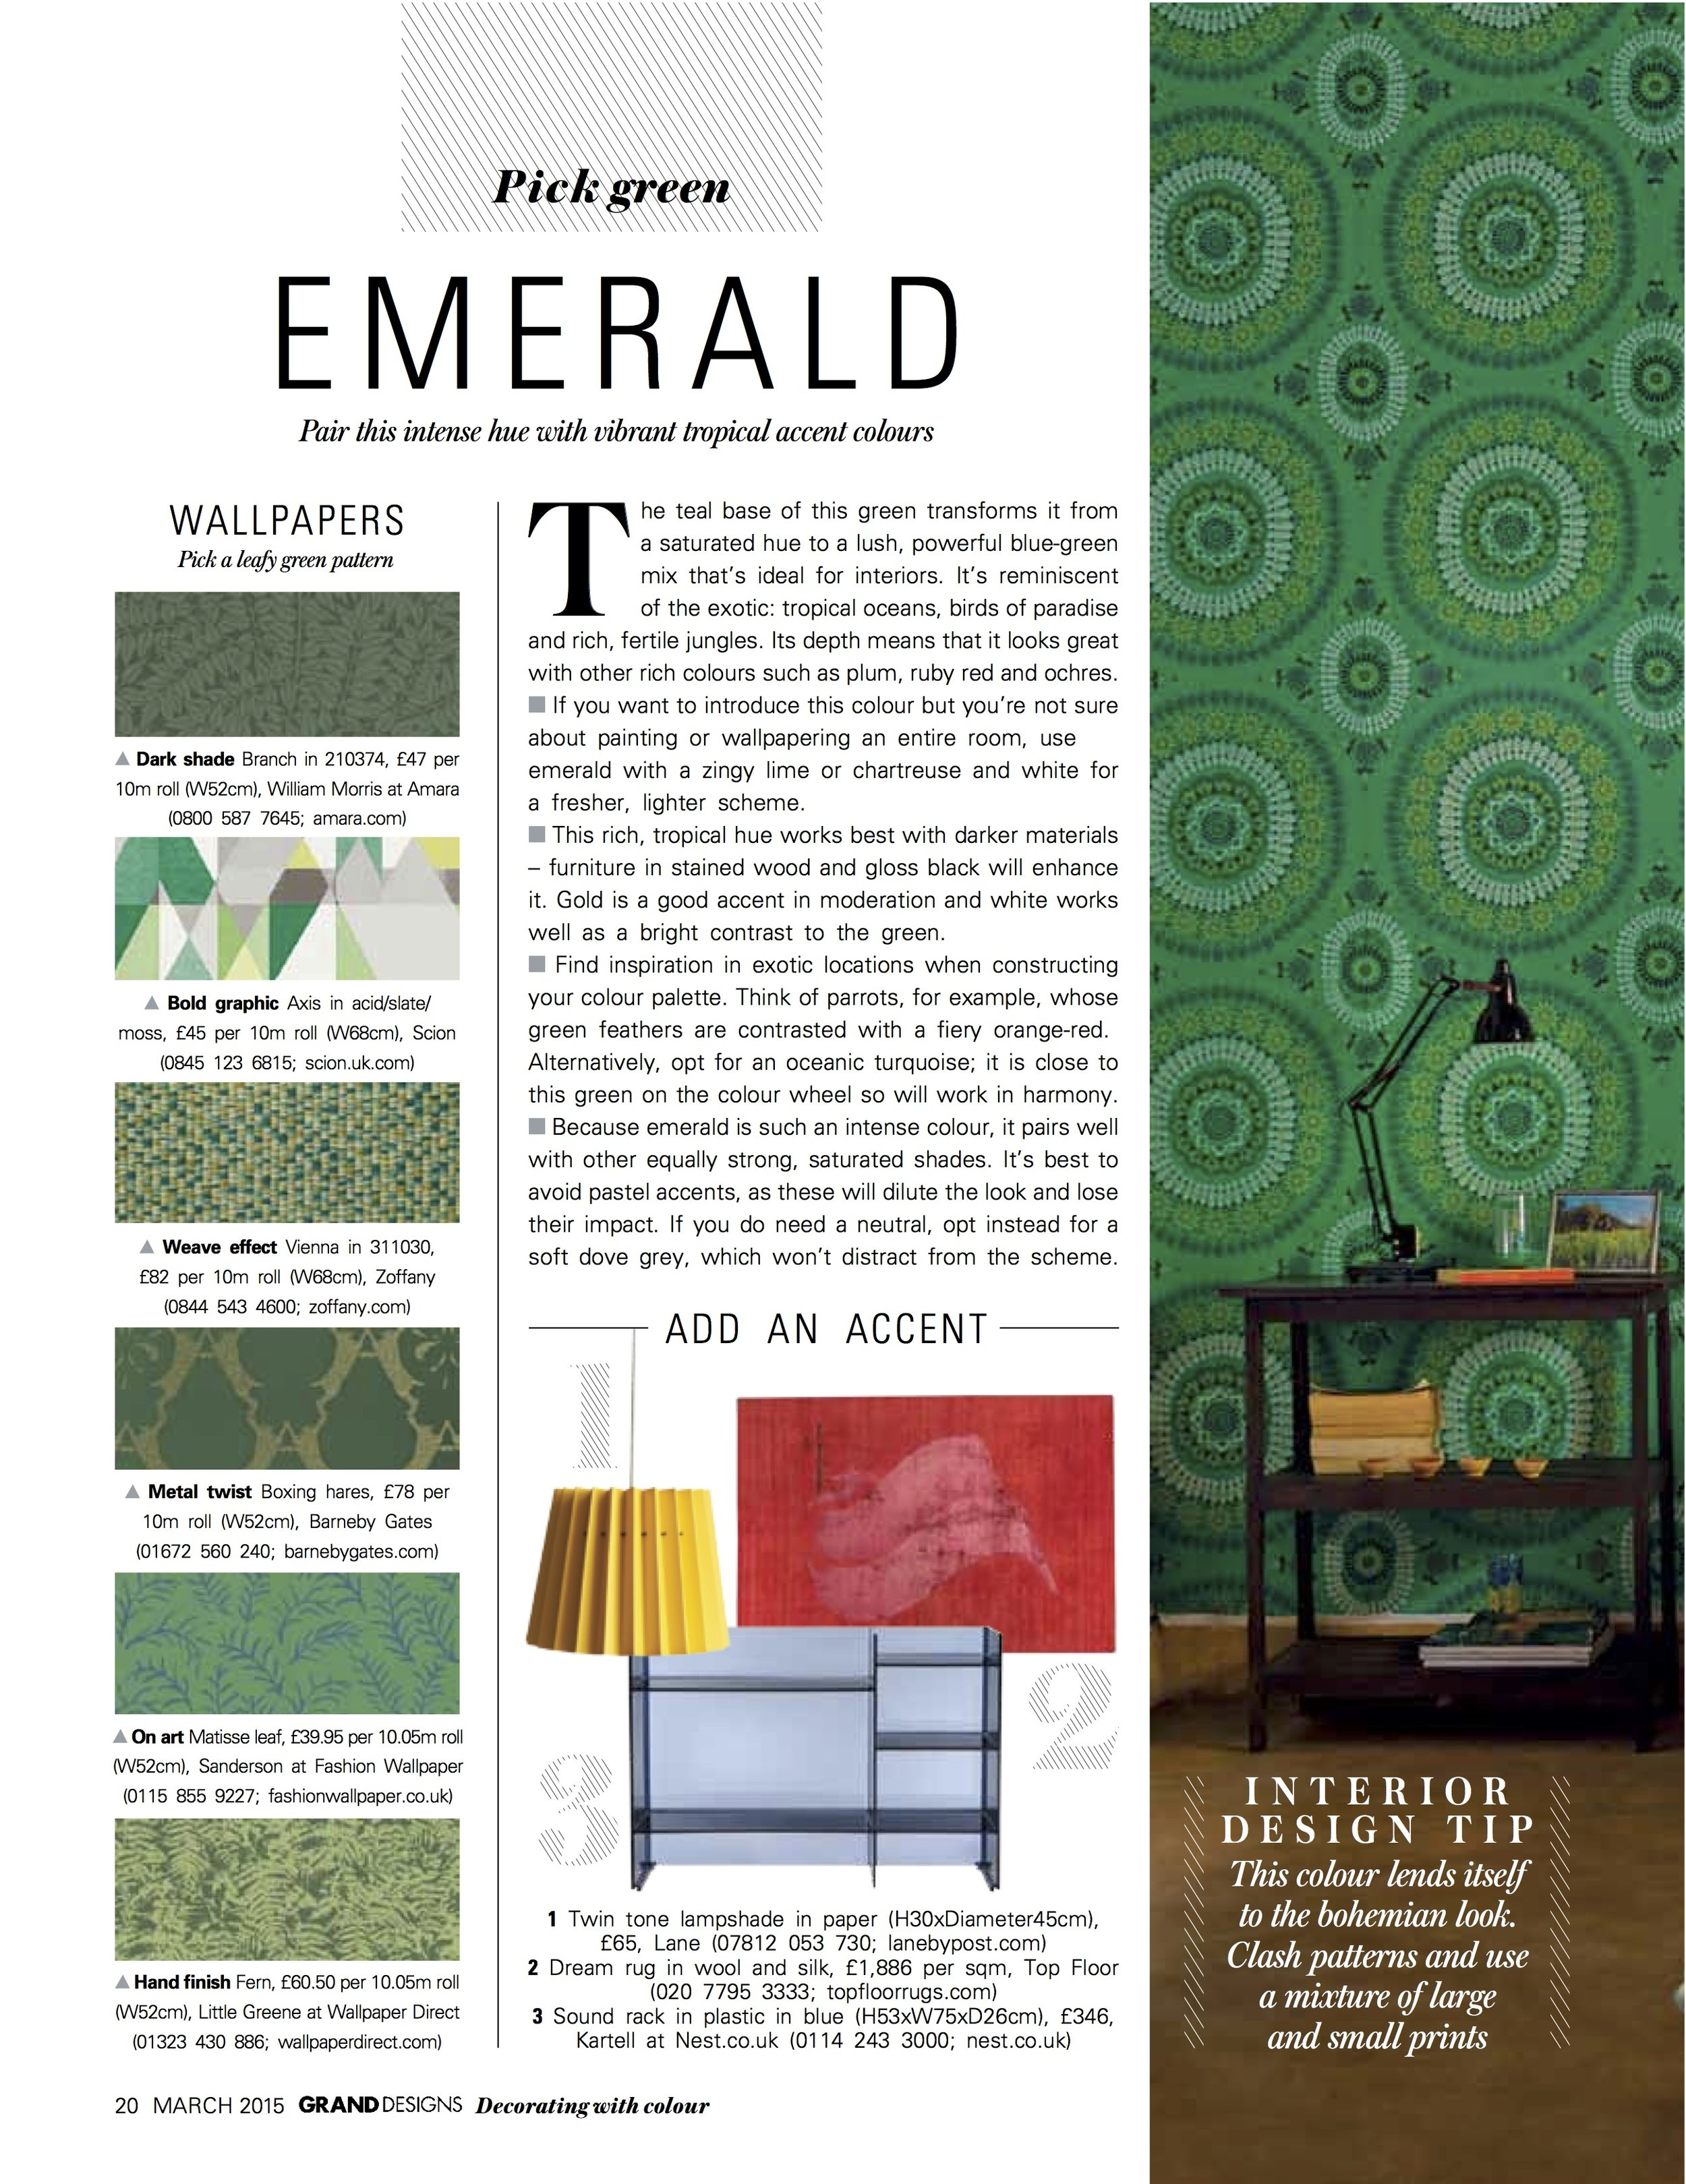 Grand Designs Magazine, March 2015,  Lane & Little Greene Twin Tone Lampshades